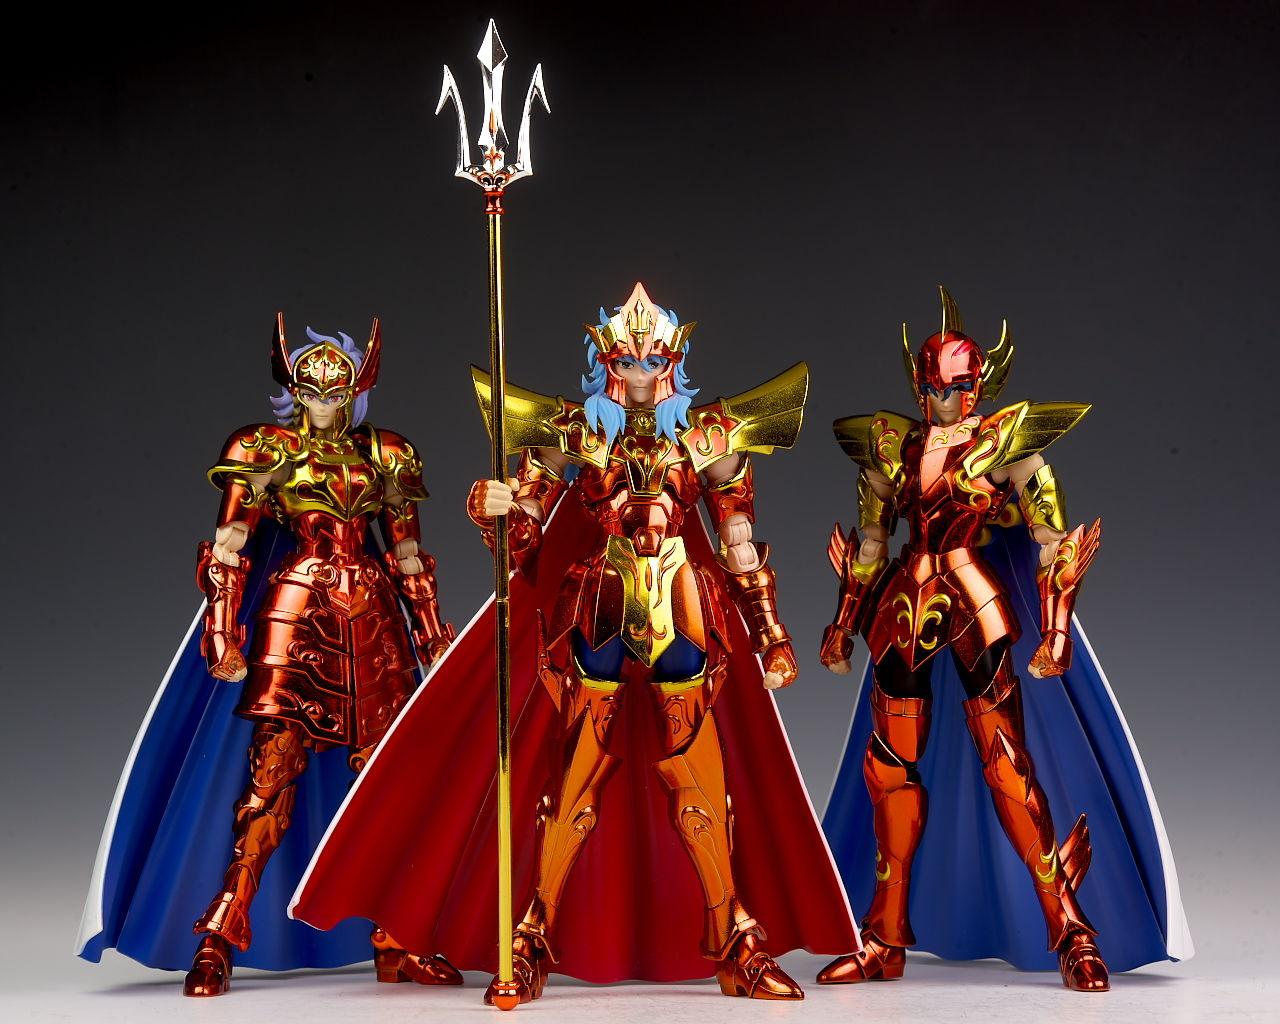 [Imagens] Poseidon EX & Poseidon EX Imperial Throne Set TywsrlCC_o